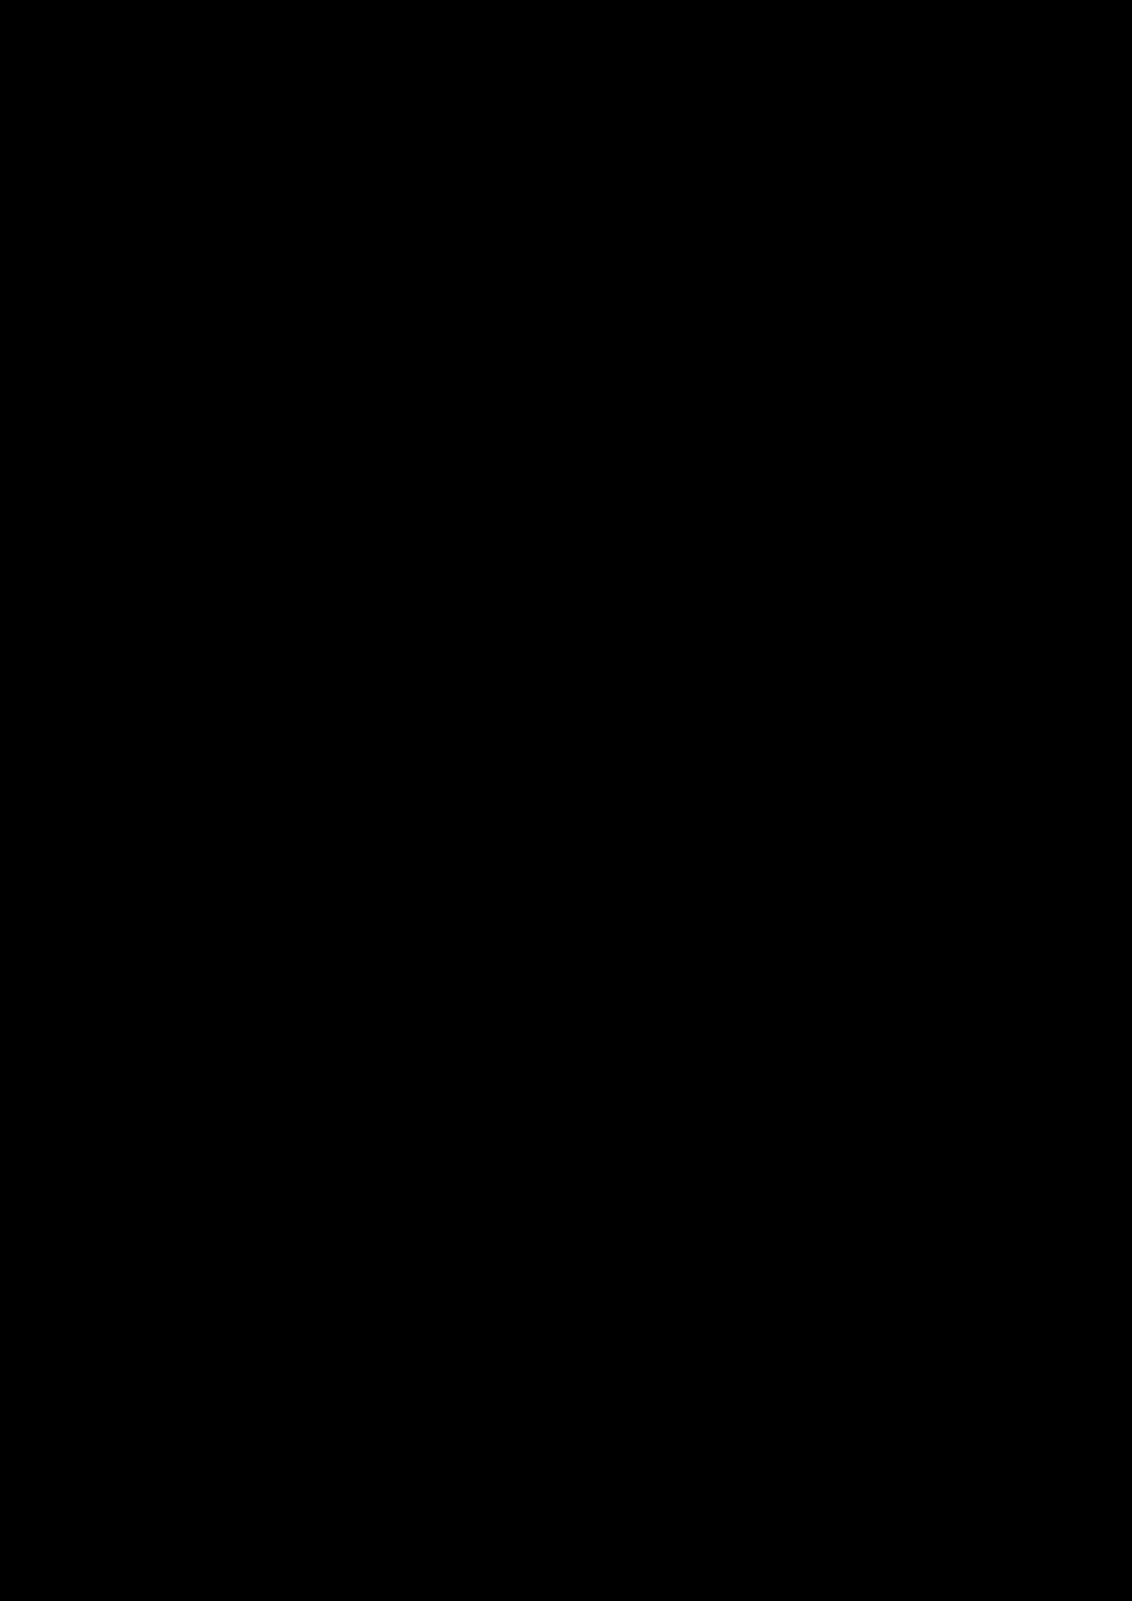 Ispoved Pervogo Boga slide, Image 14